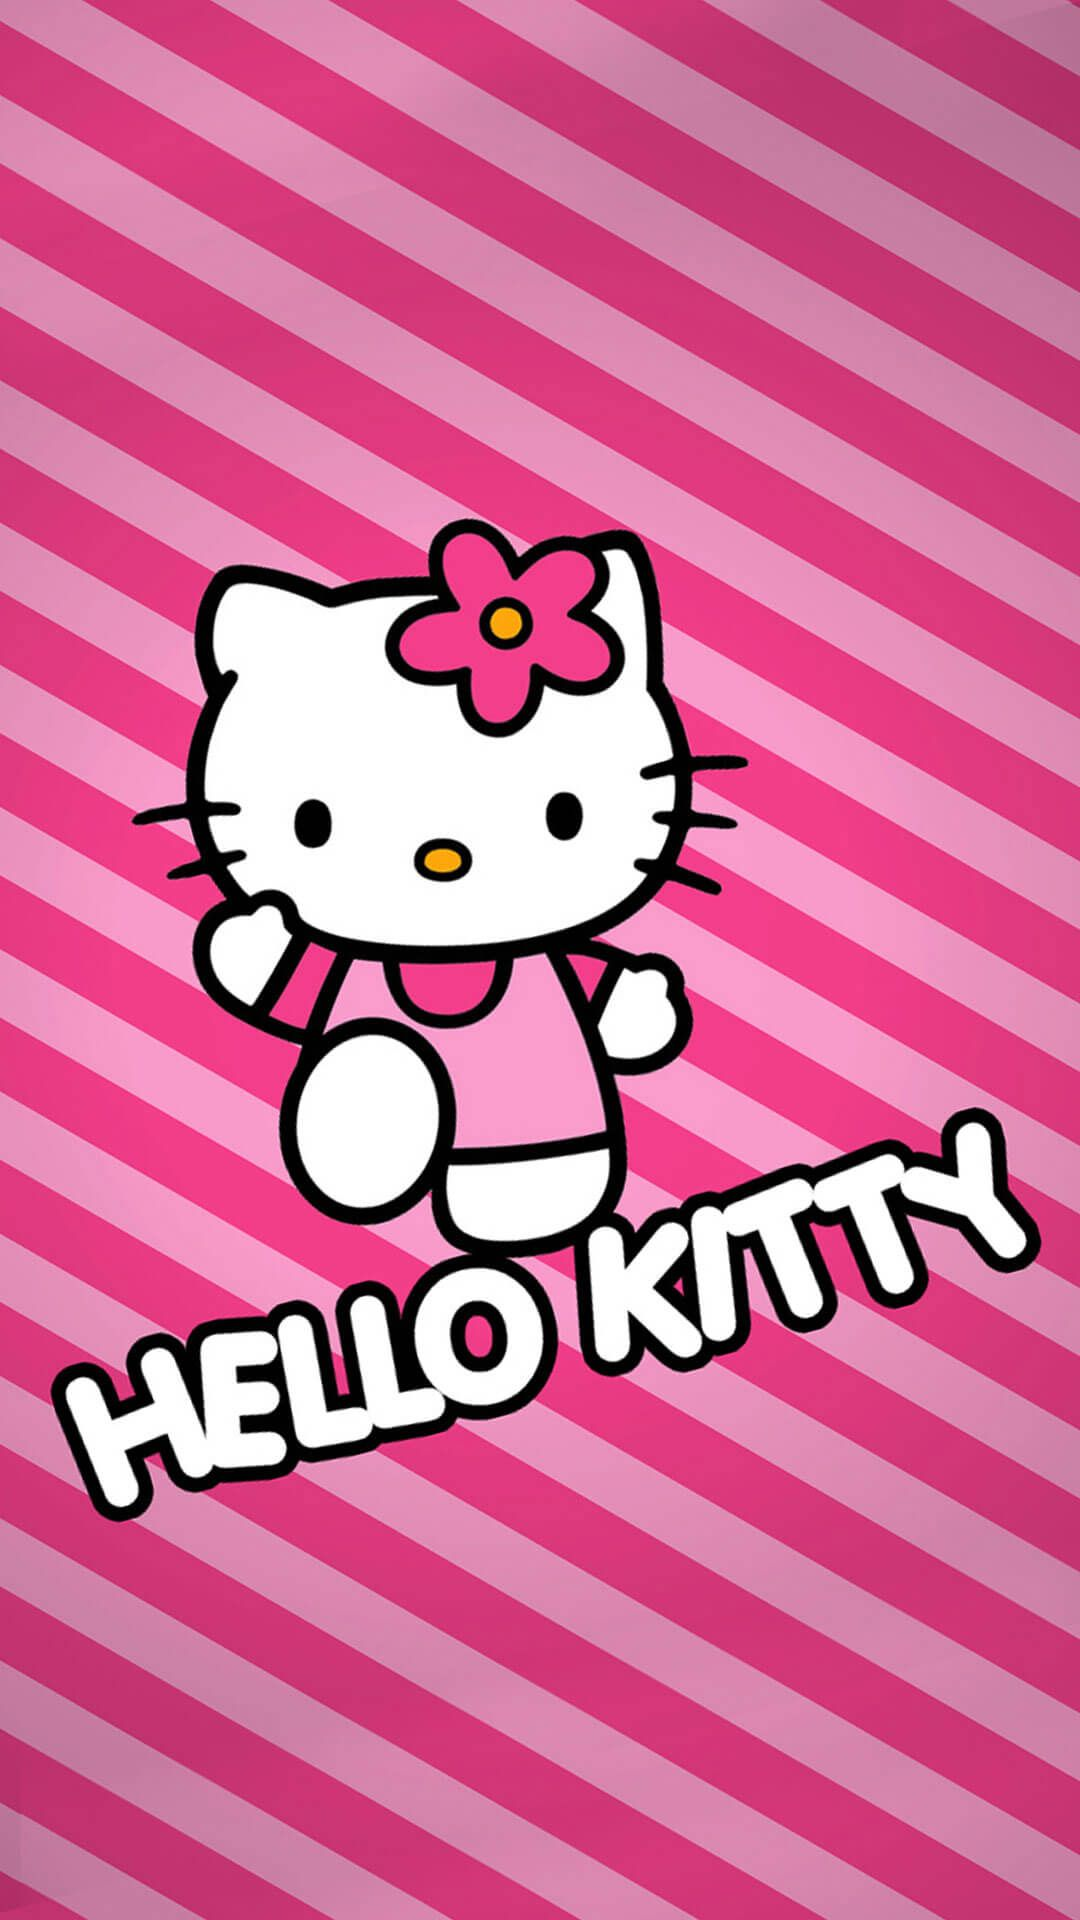 Iphone 5 wallpaper tumblr girly pink - Hello Kitty Iphone 6 Wallpaper Tumblr Hd